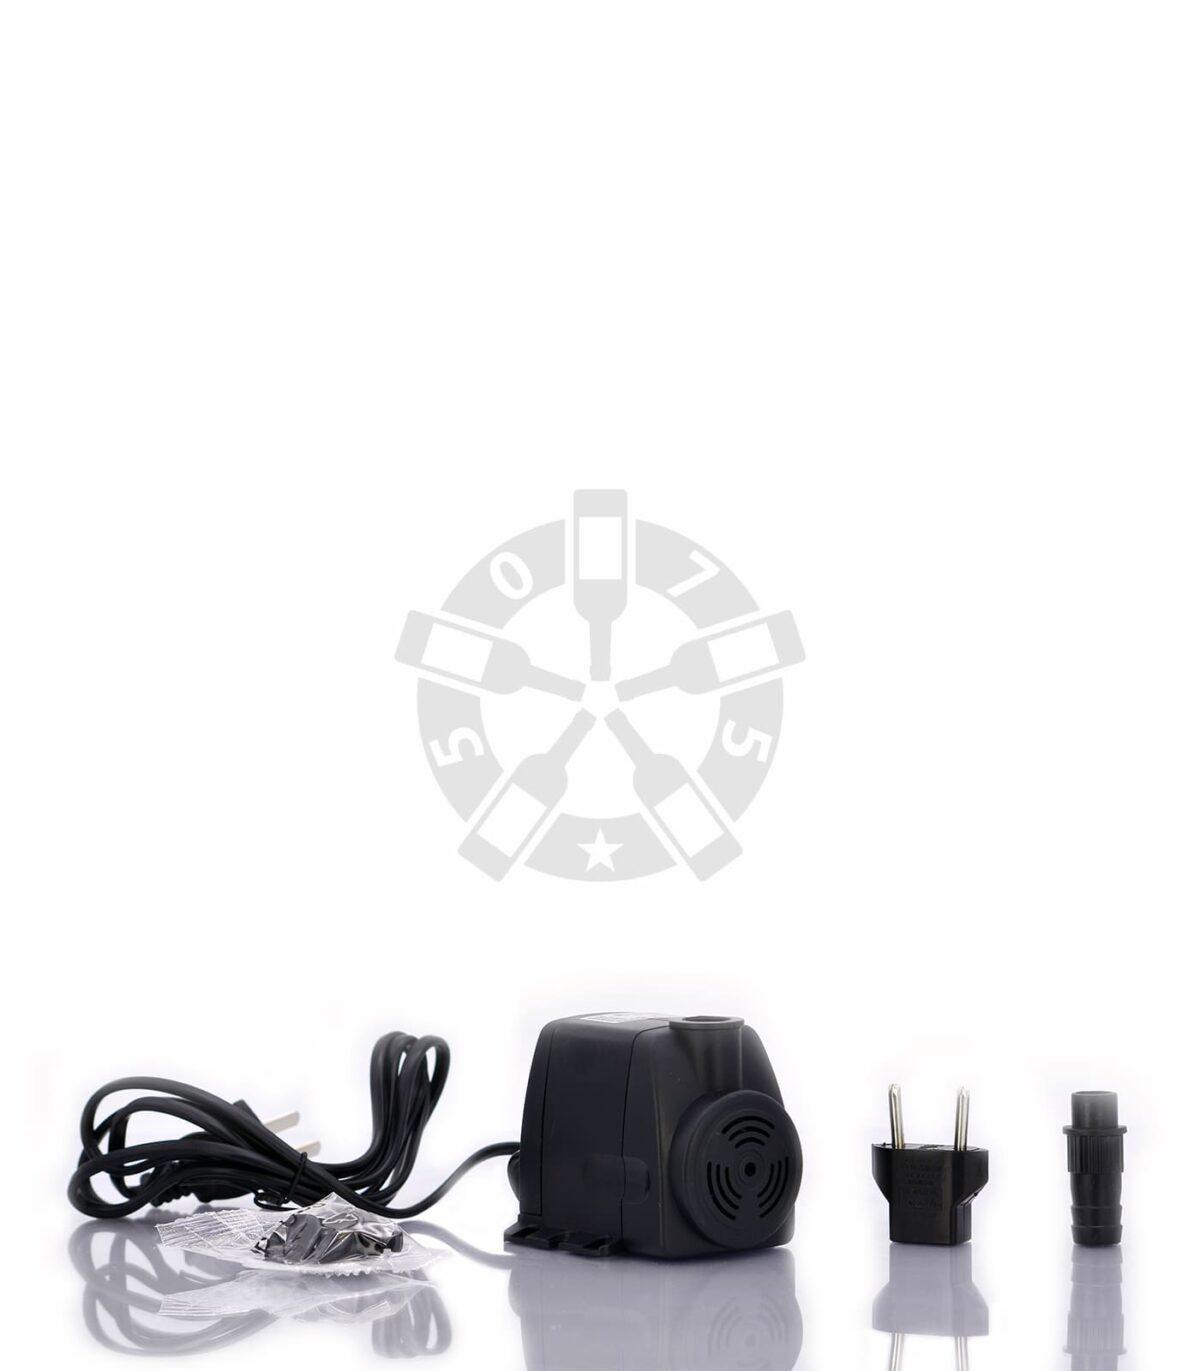 Компрессор для автономного охлаждения (8W,600 л.ч), ТМ SunSun